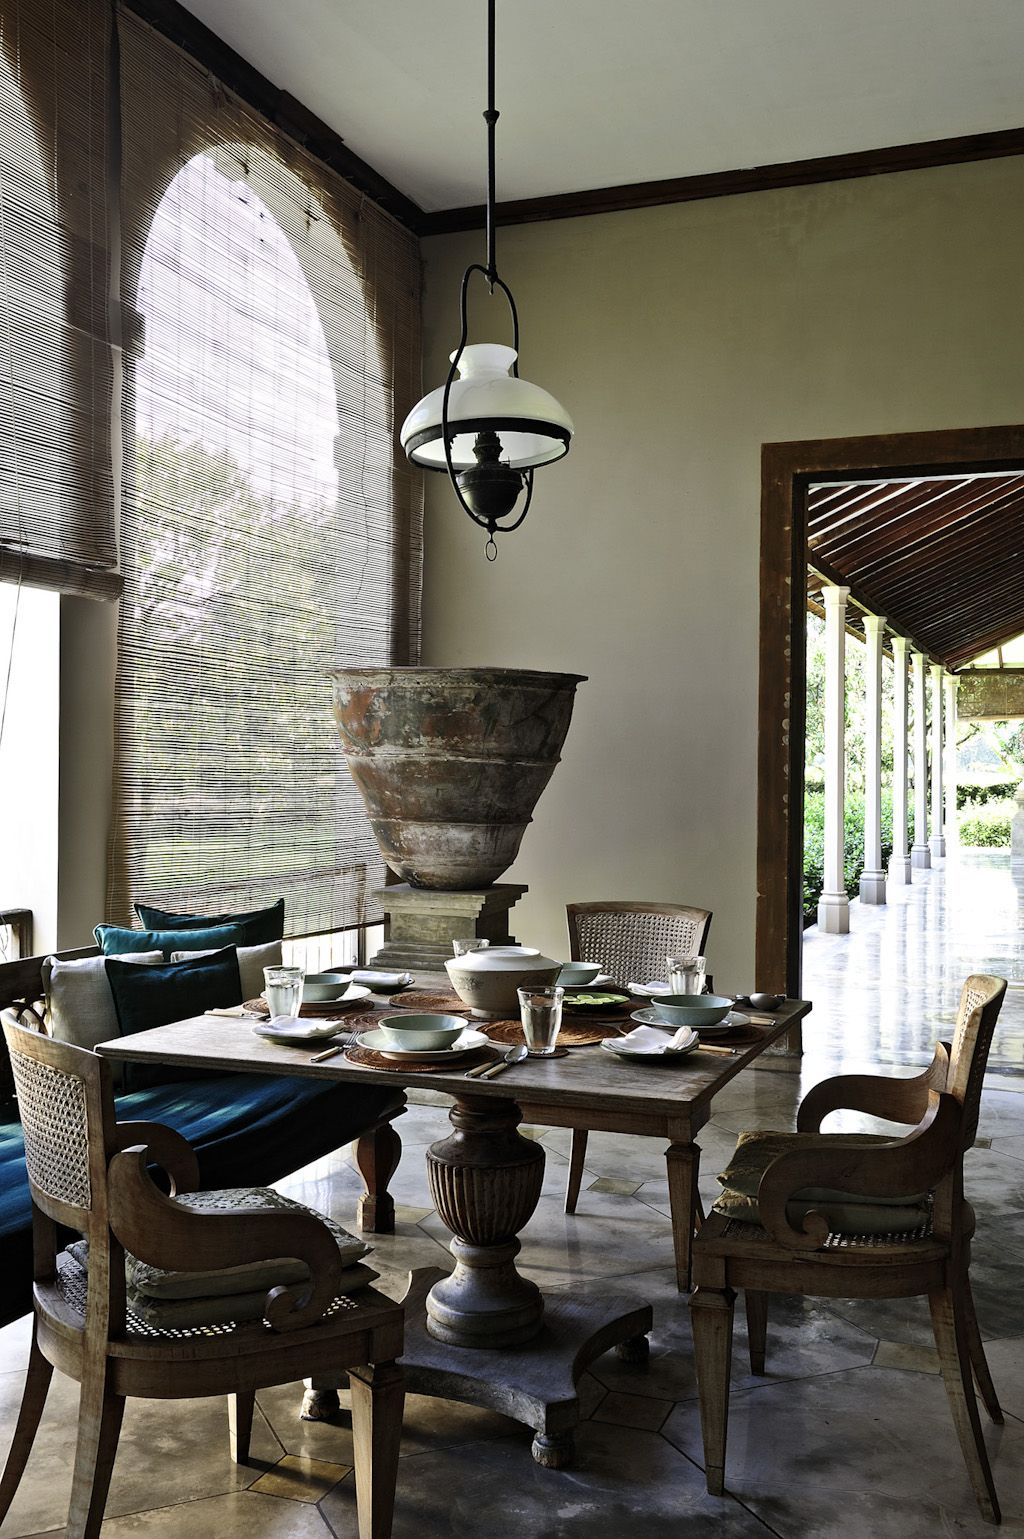 Indonesian Dinning Room Decor Indonesianstyle Homedecor Livestreamasia